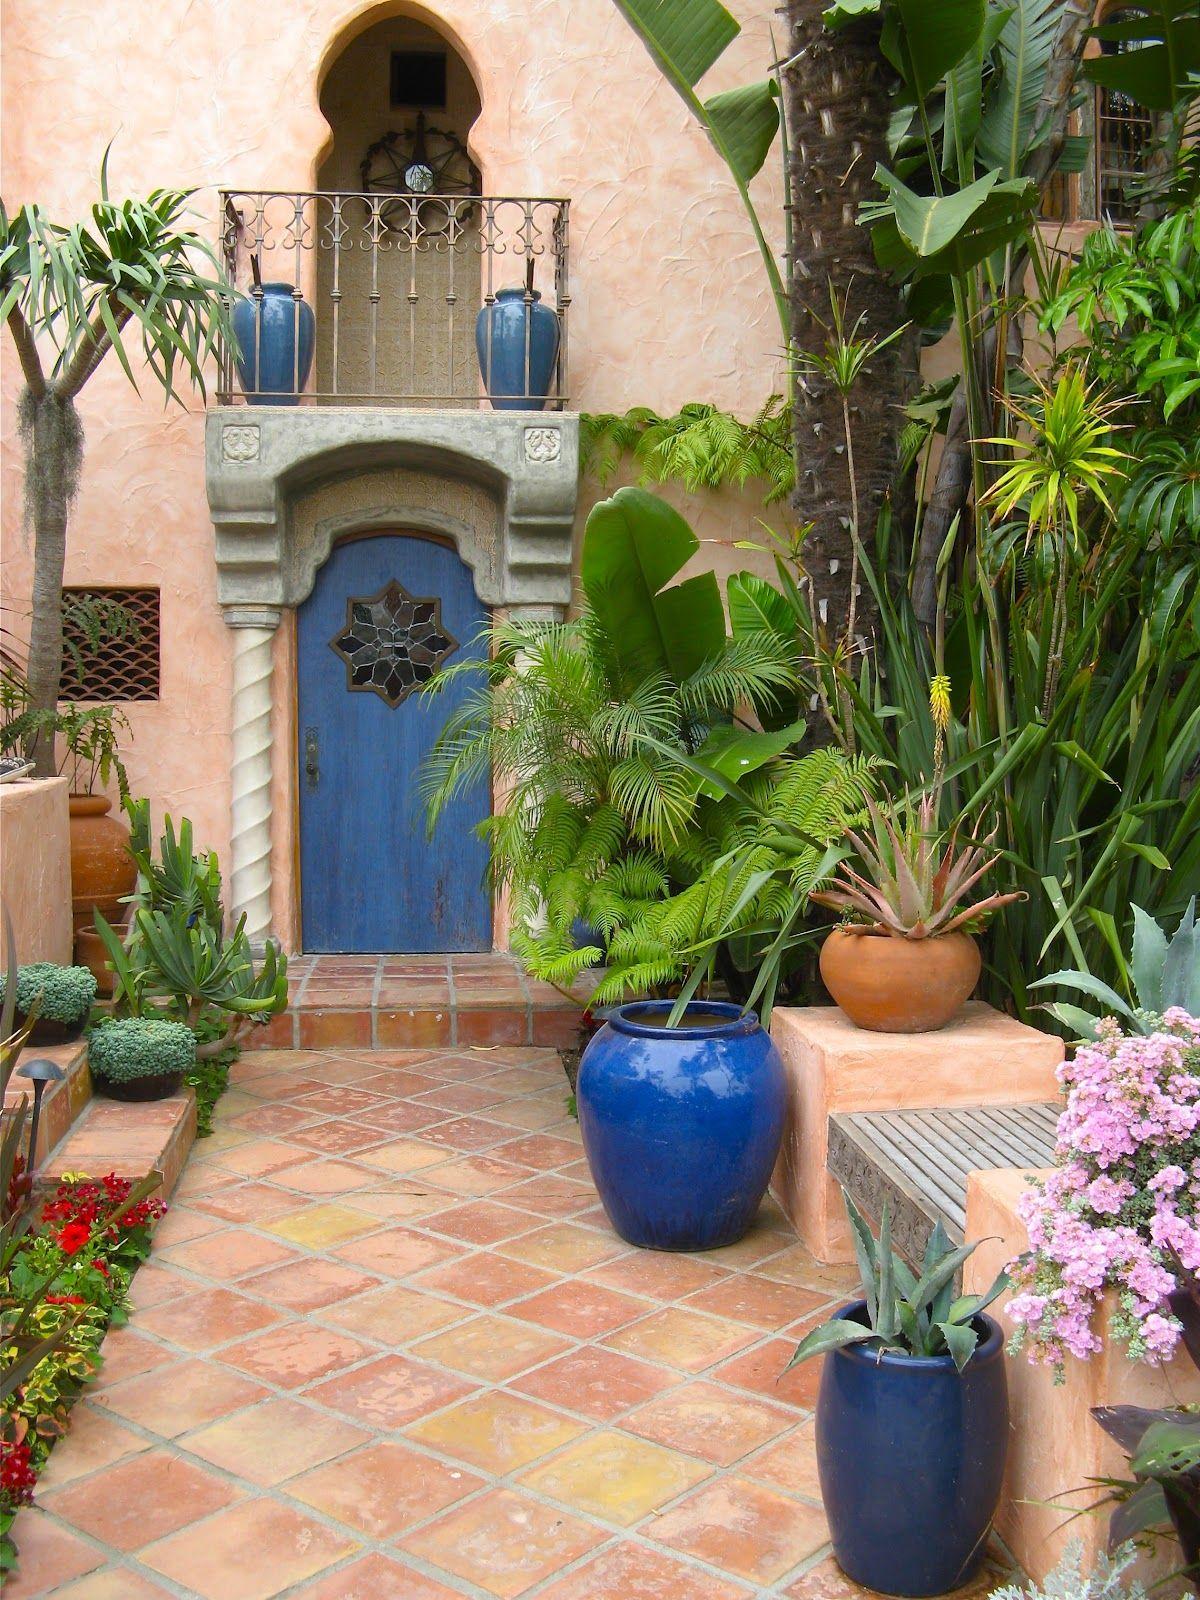 Moroccan garden ar bia pinterest gardens front for Small french courtyard gardens